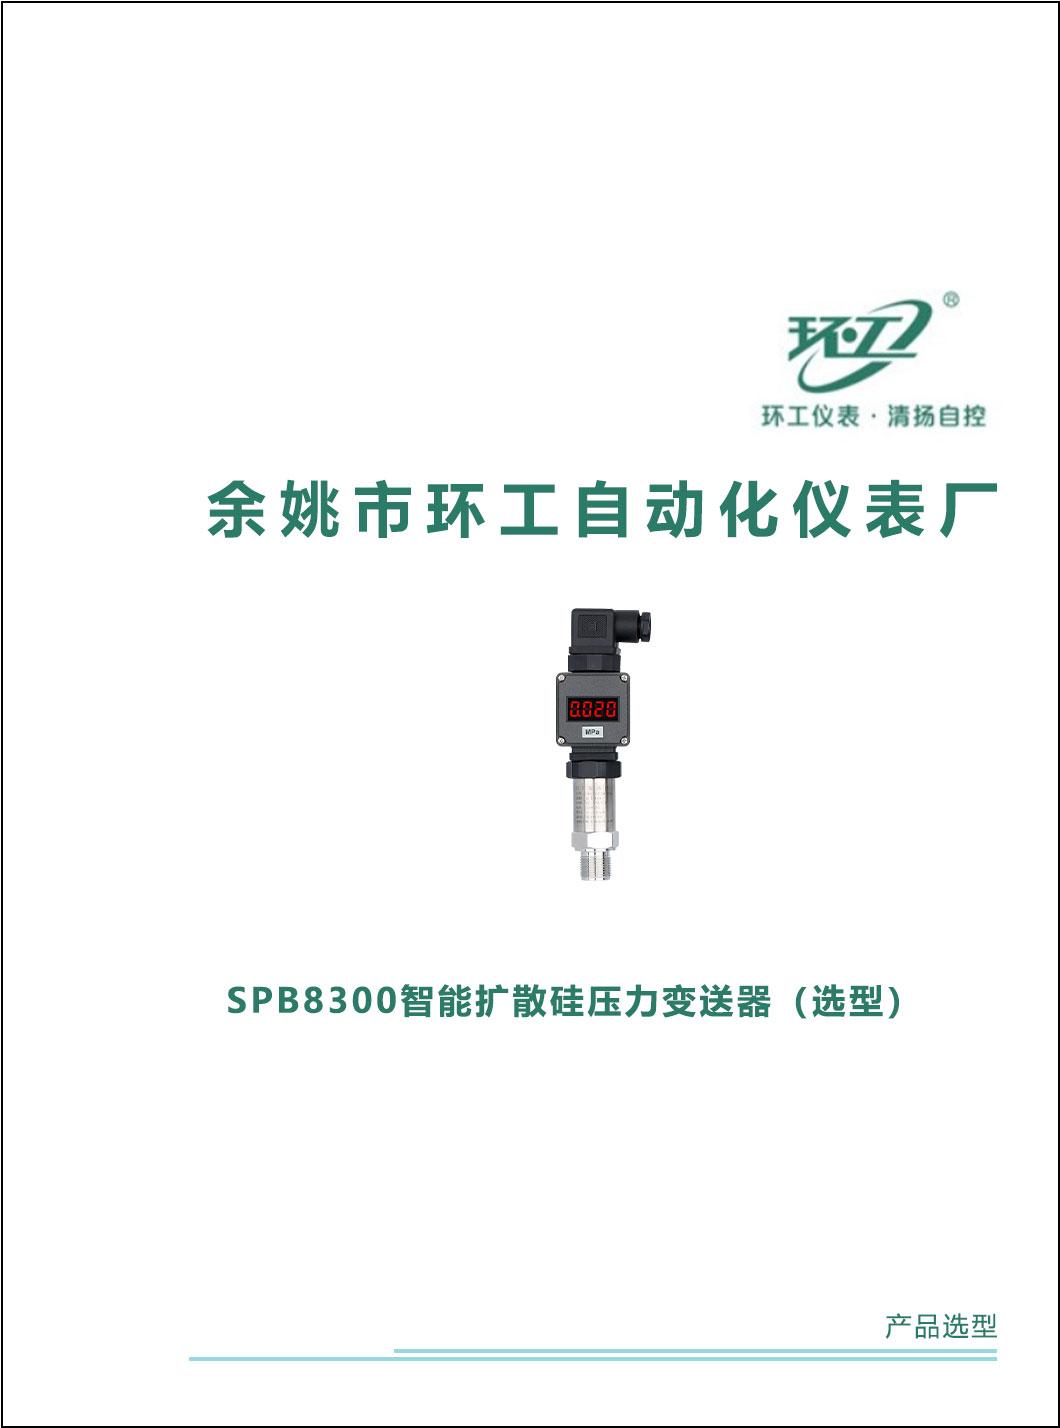 SPB8300智能扩散硅压力变送器-环工仪表-清扬自控